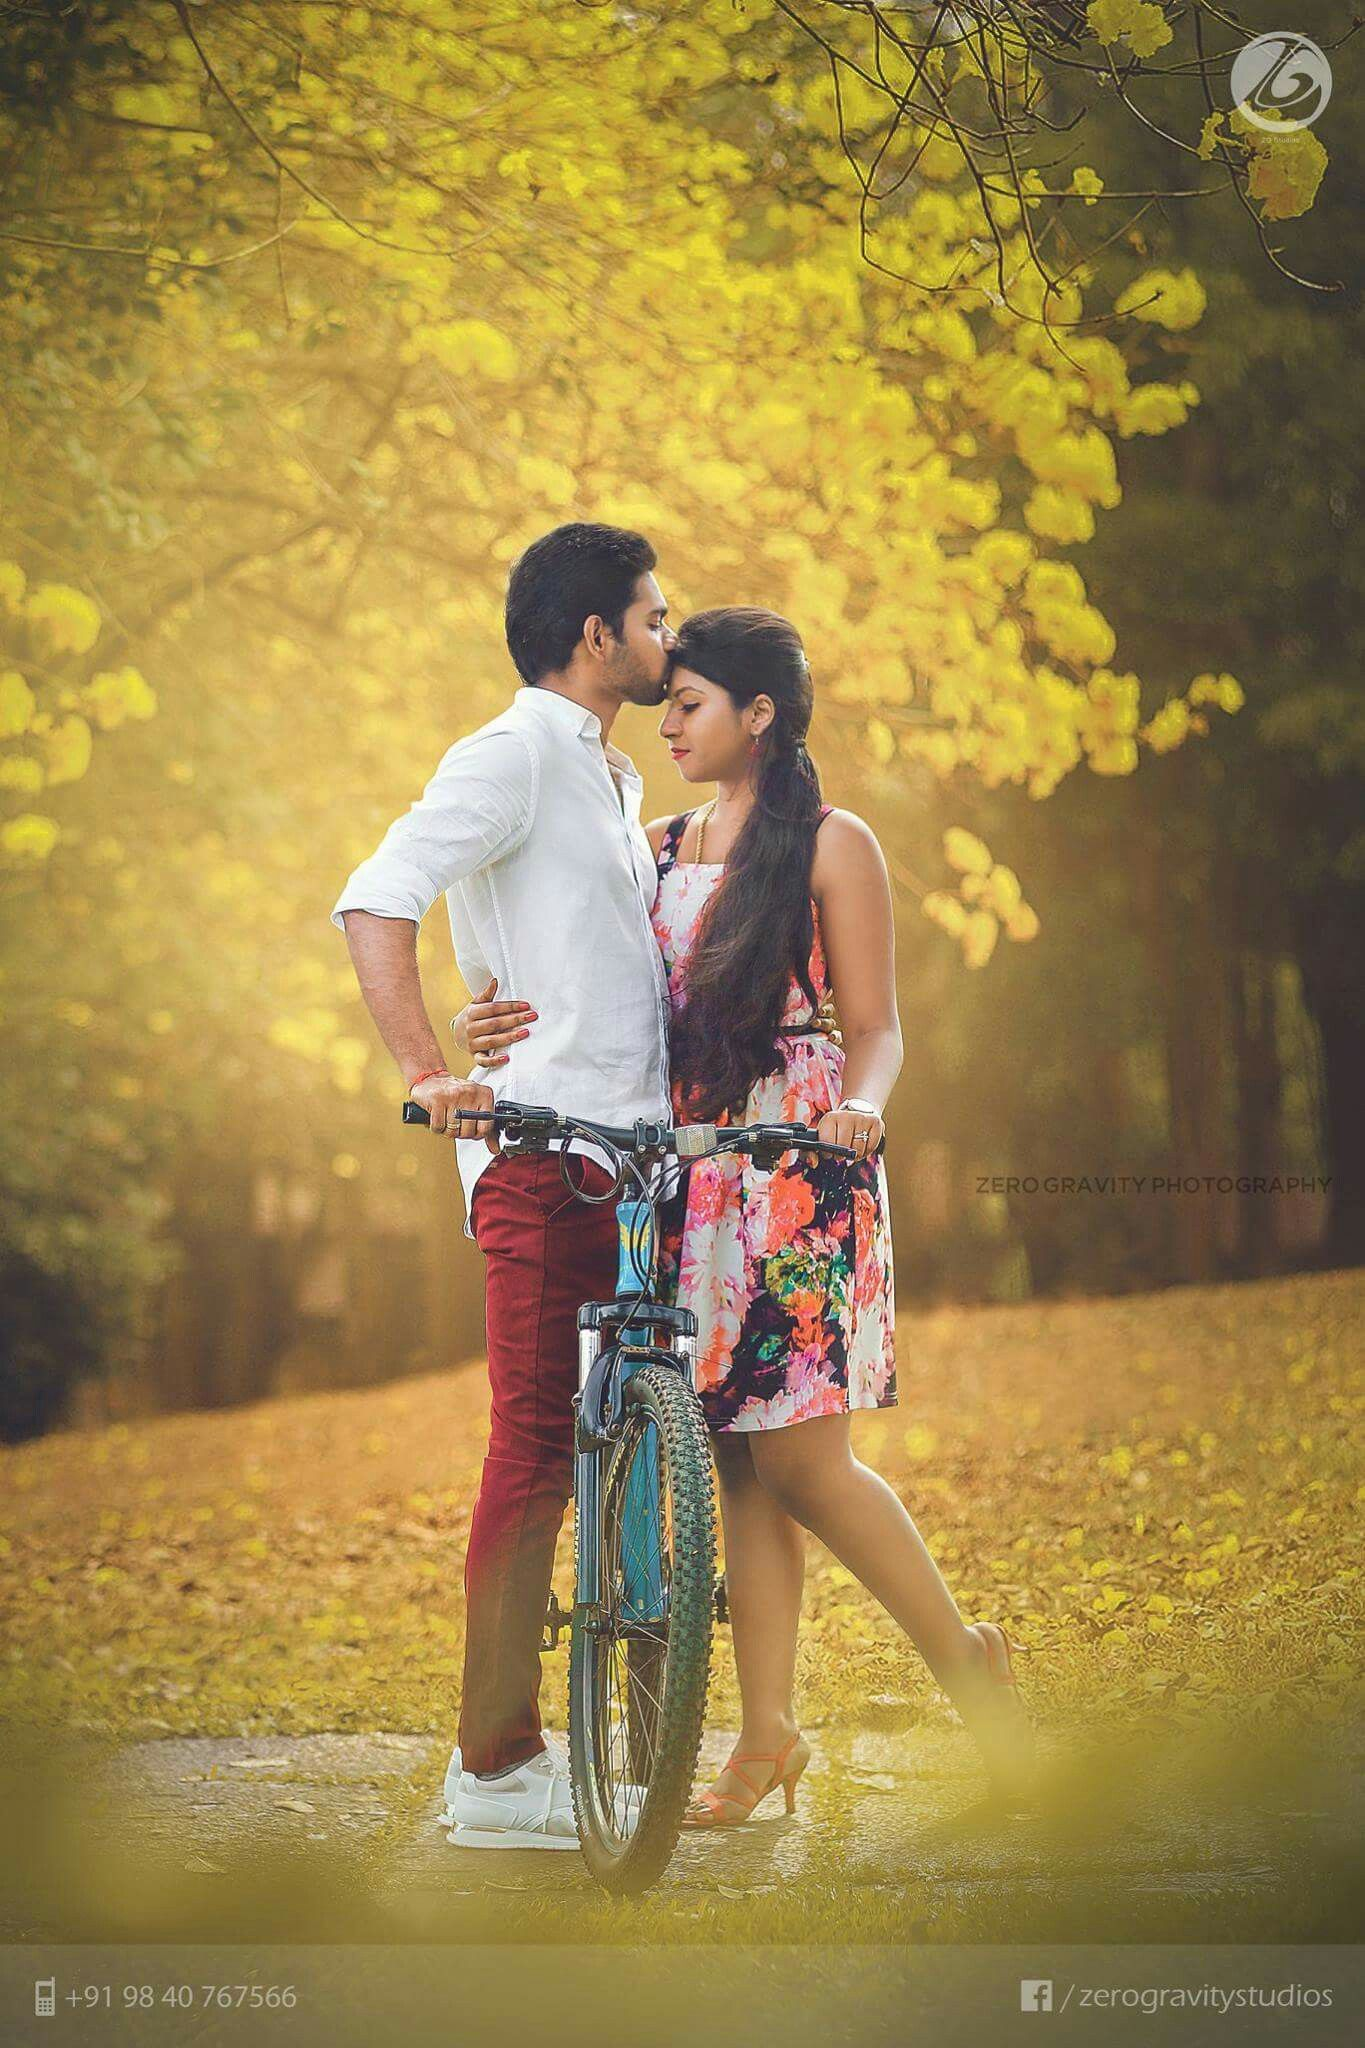 Pre wedding poses by lalitha kasiraj on snaps Pre